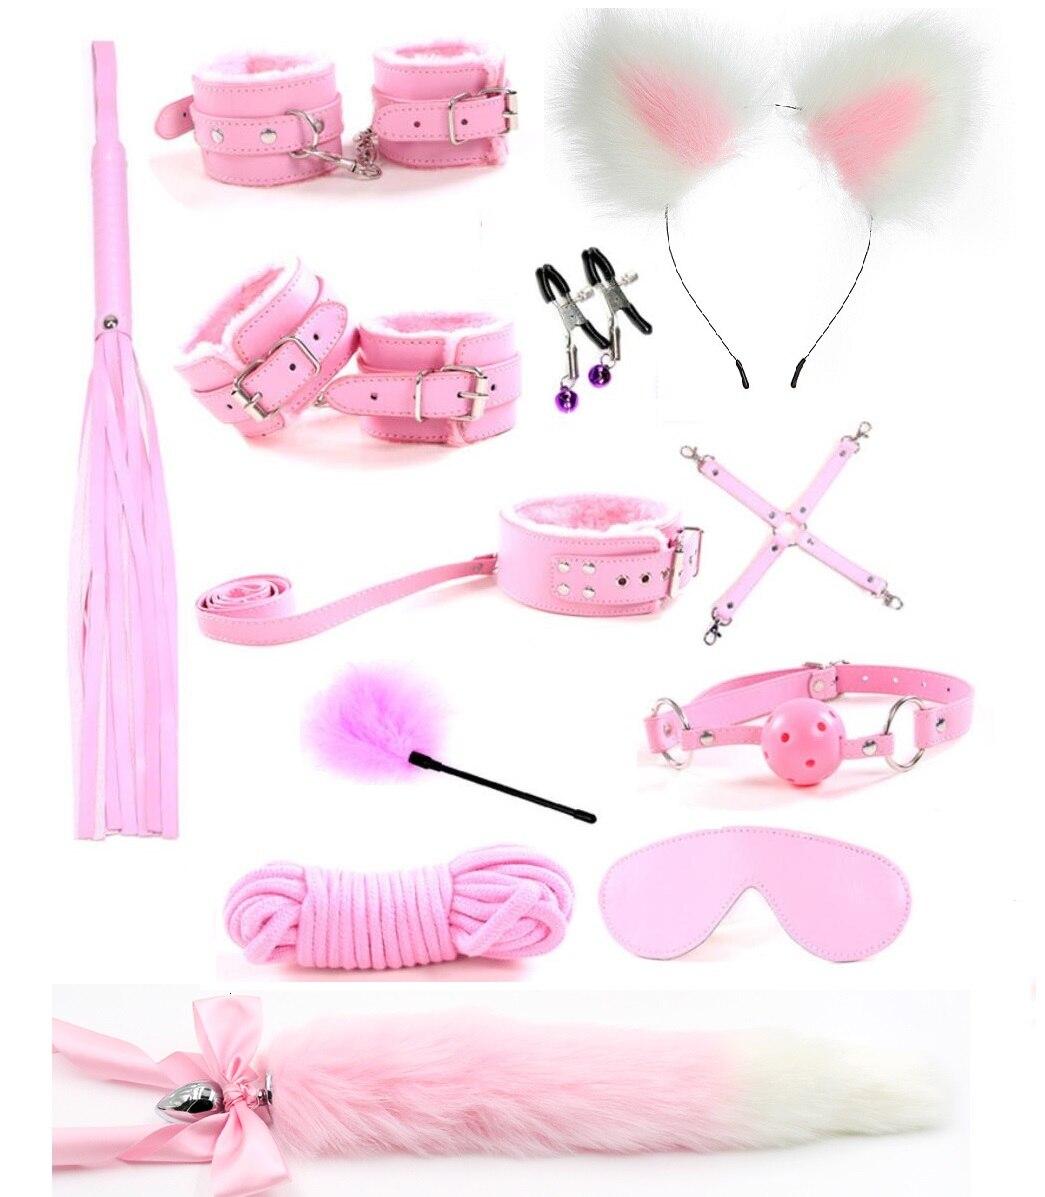 12Pcs/set Cute Metal Fox Tail Anal Butt Plug Handcuffs Bdsm Bondage Nipple Clamp Erotic Adult Sex Toy Tools For Couple Women